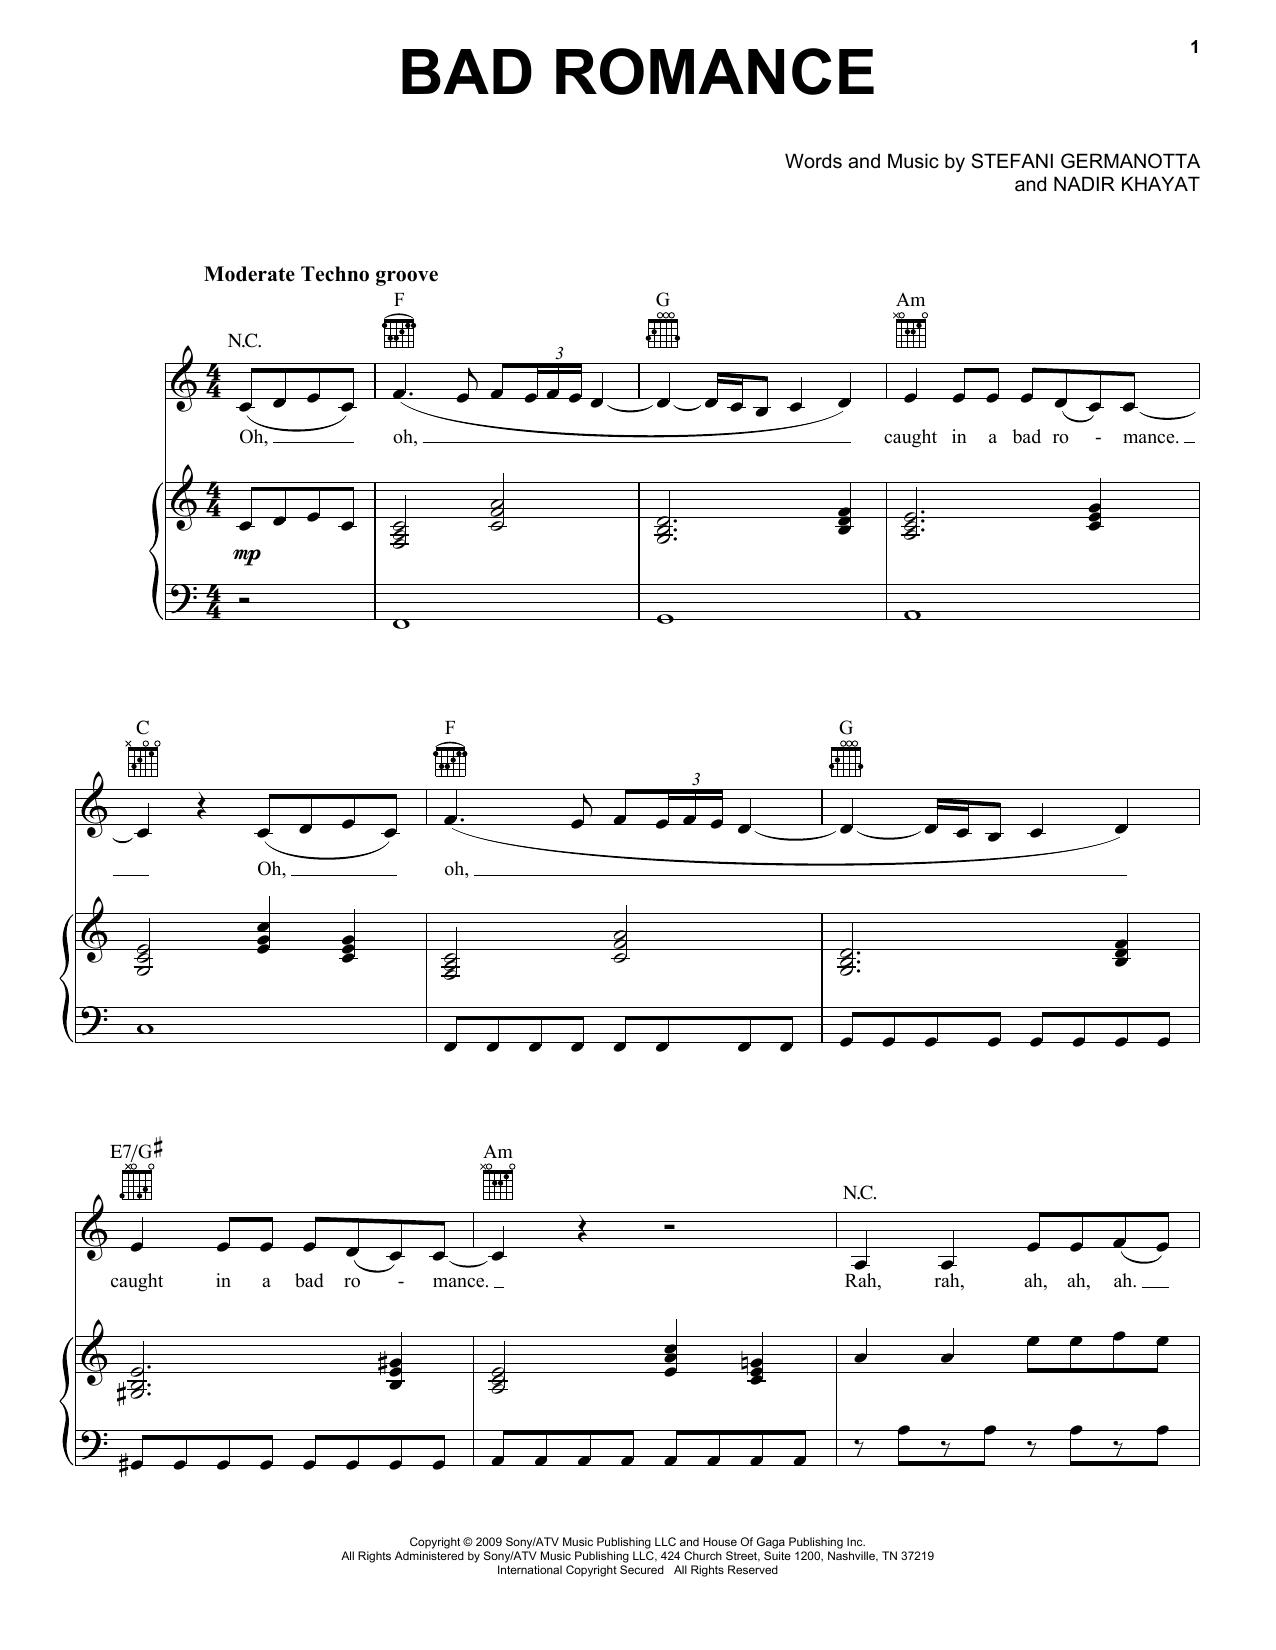 Lady Gaga Bad Romance sheet music notes and chords. Download Printable PDF.